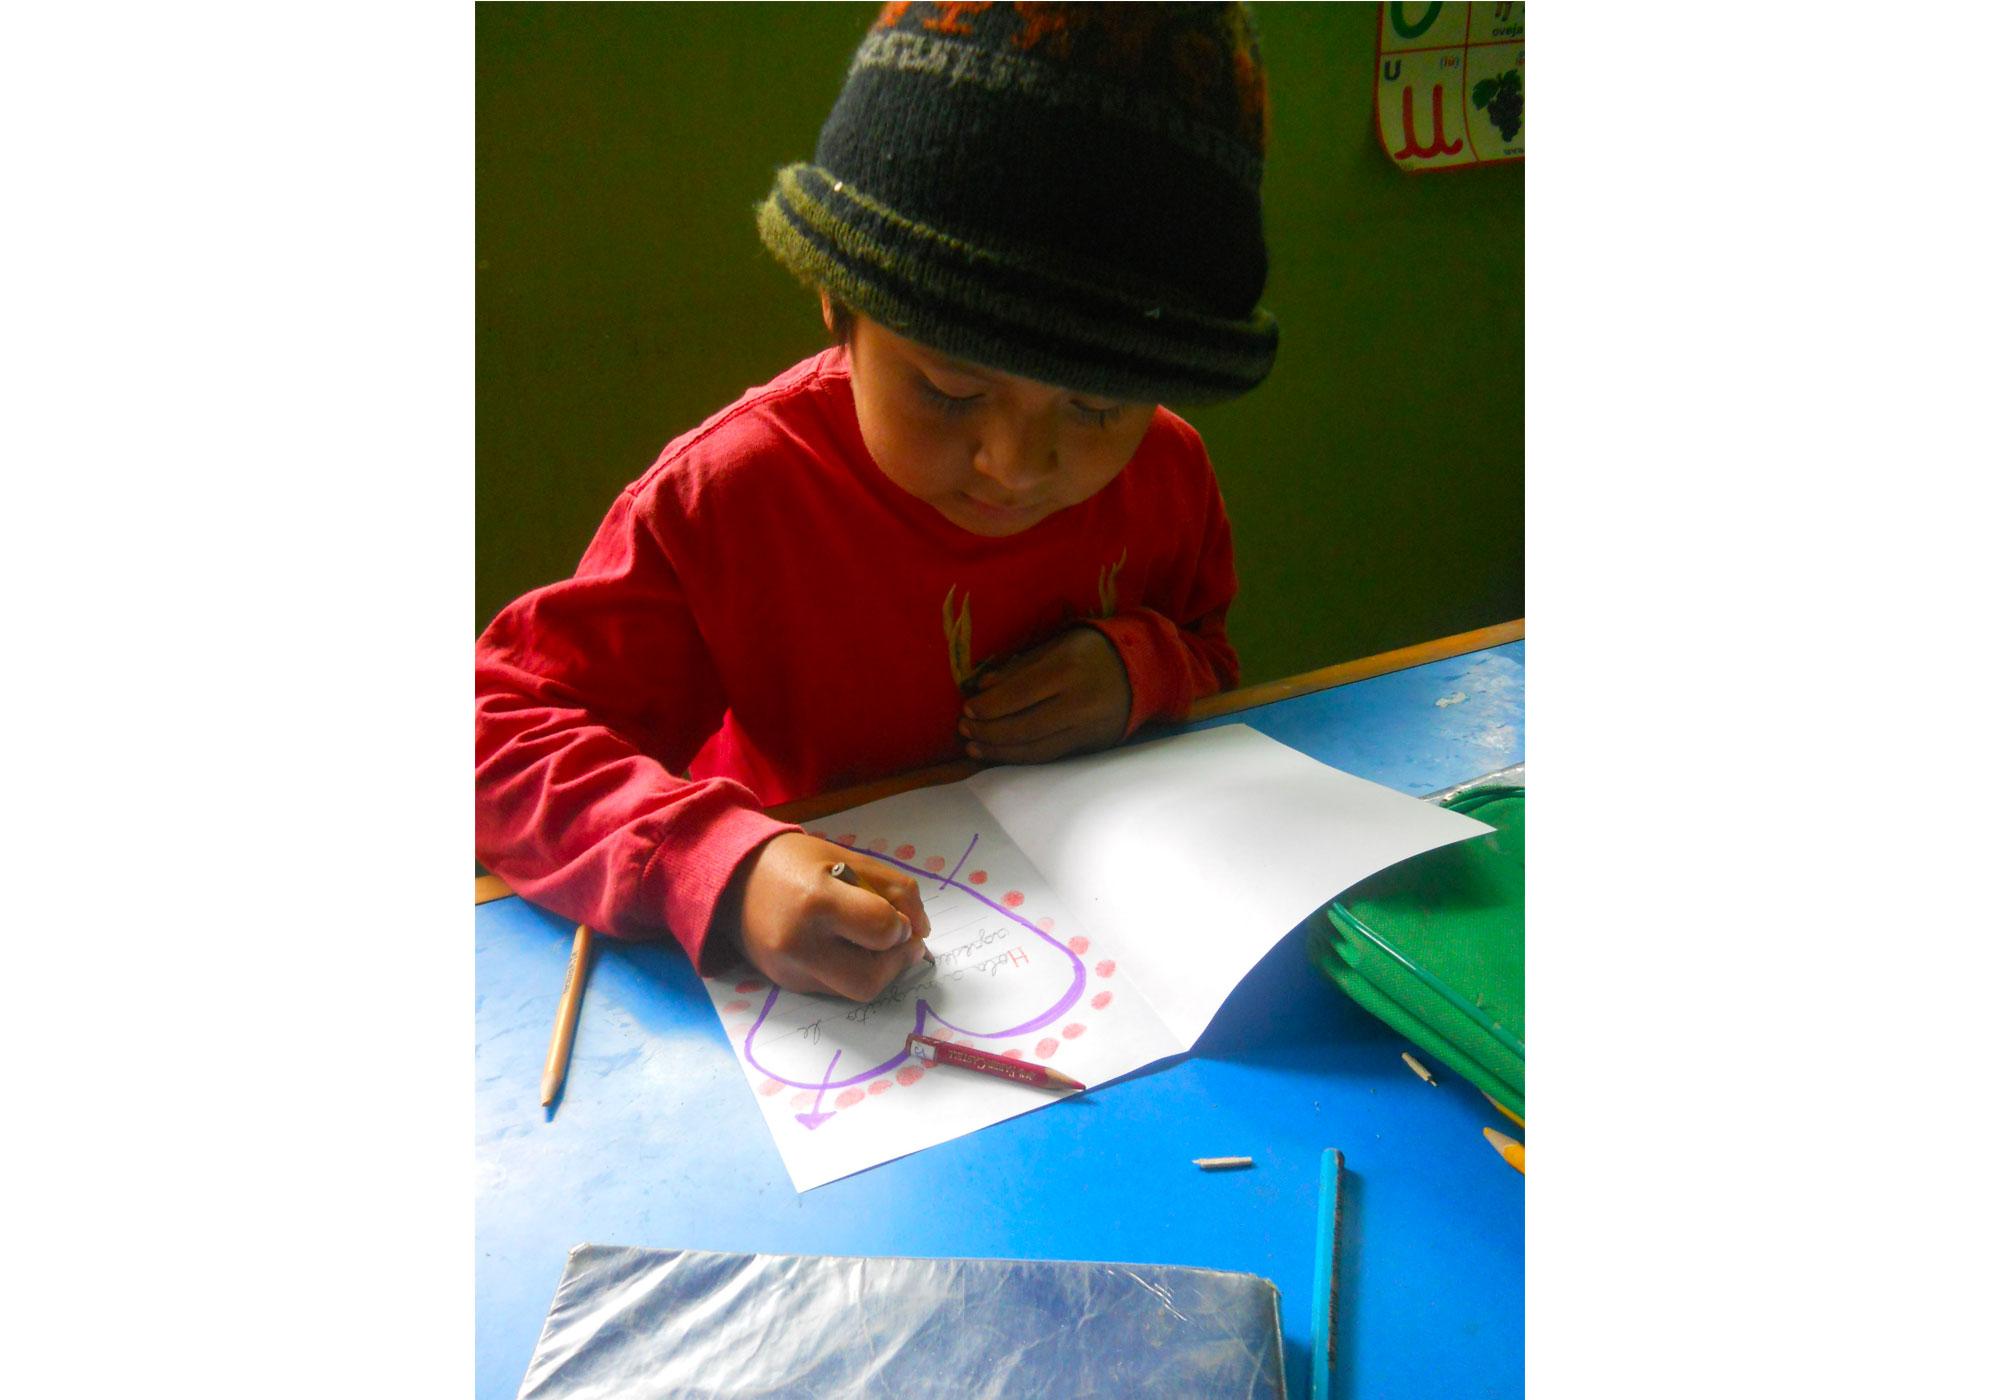 Leonardo disegna e scrive